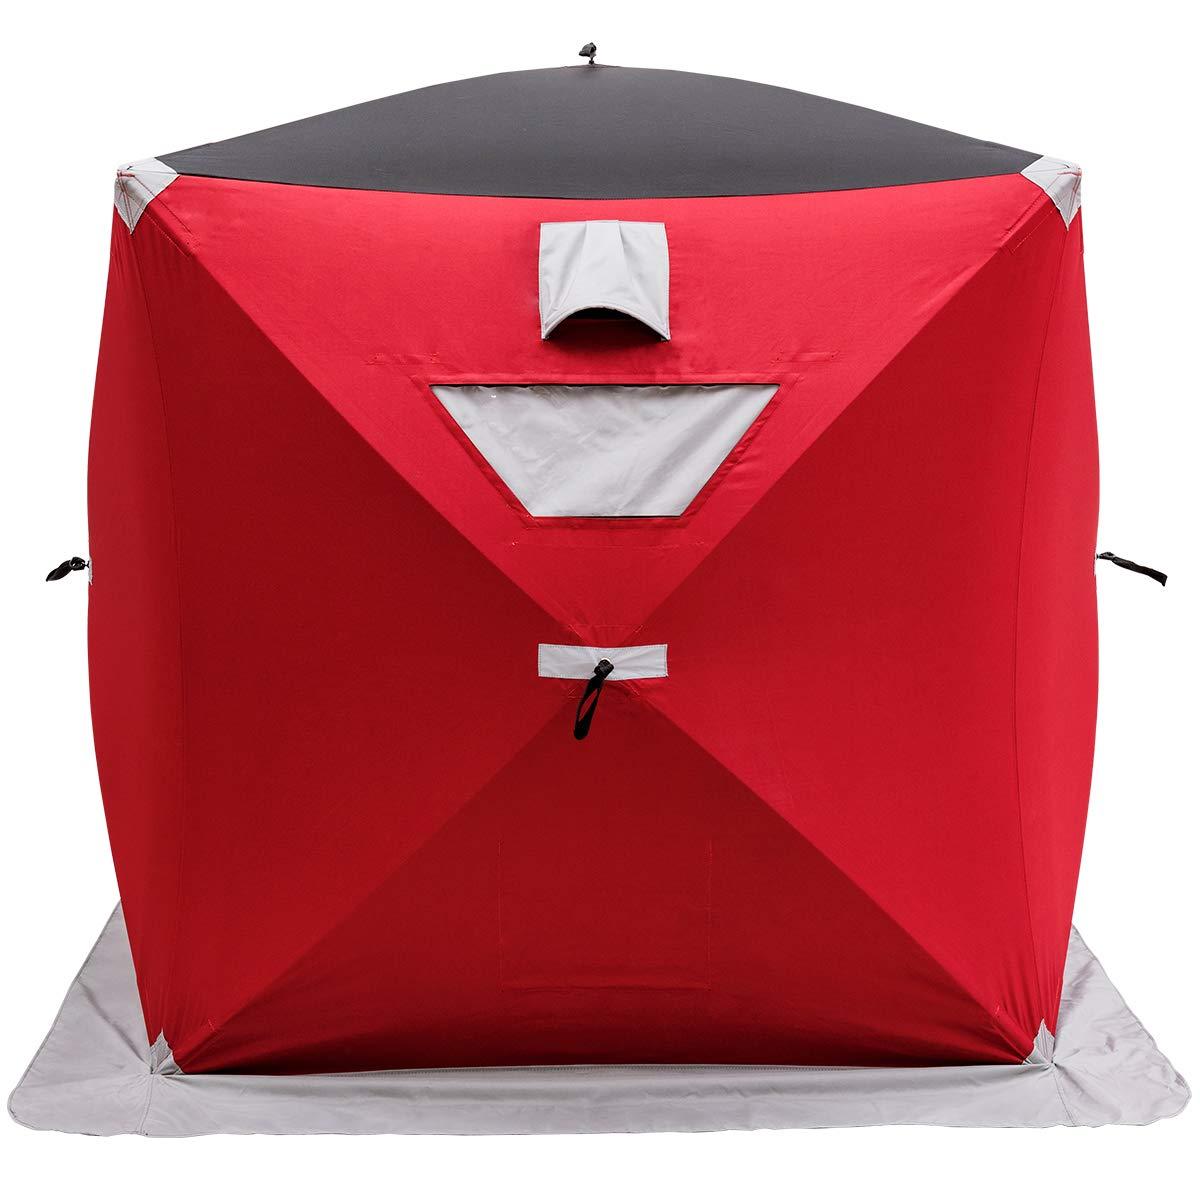 GYMAX 釣り用テント ポータブル アイステント ポップアップ アイスシェルター バッグとアイスアンカー付き   B07KN221NR